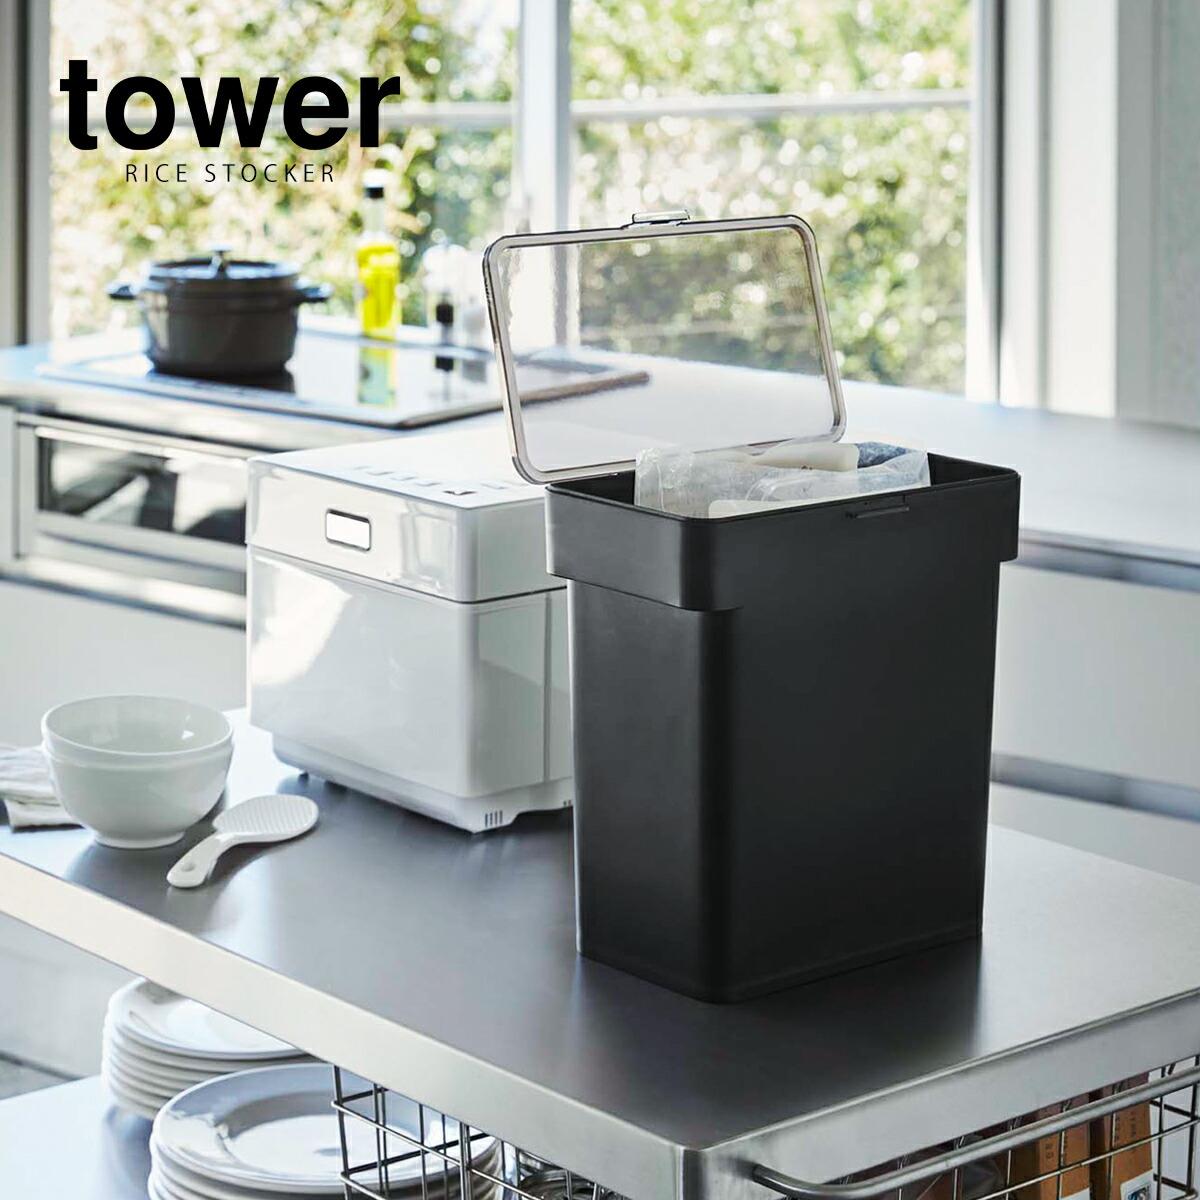 tower / タワー 密閉 袋ごと米びつ 5kg 計量カップ付 米びつ ライスストッカー ライスボックス 袋のまま